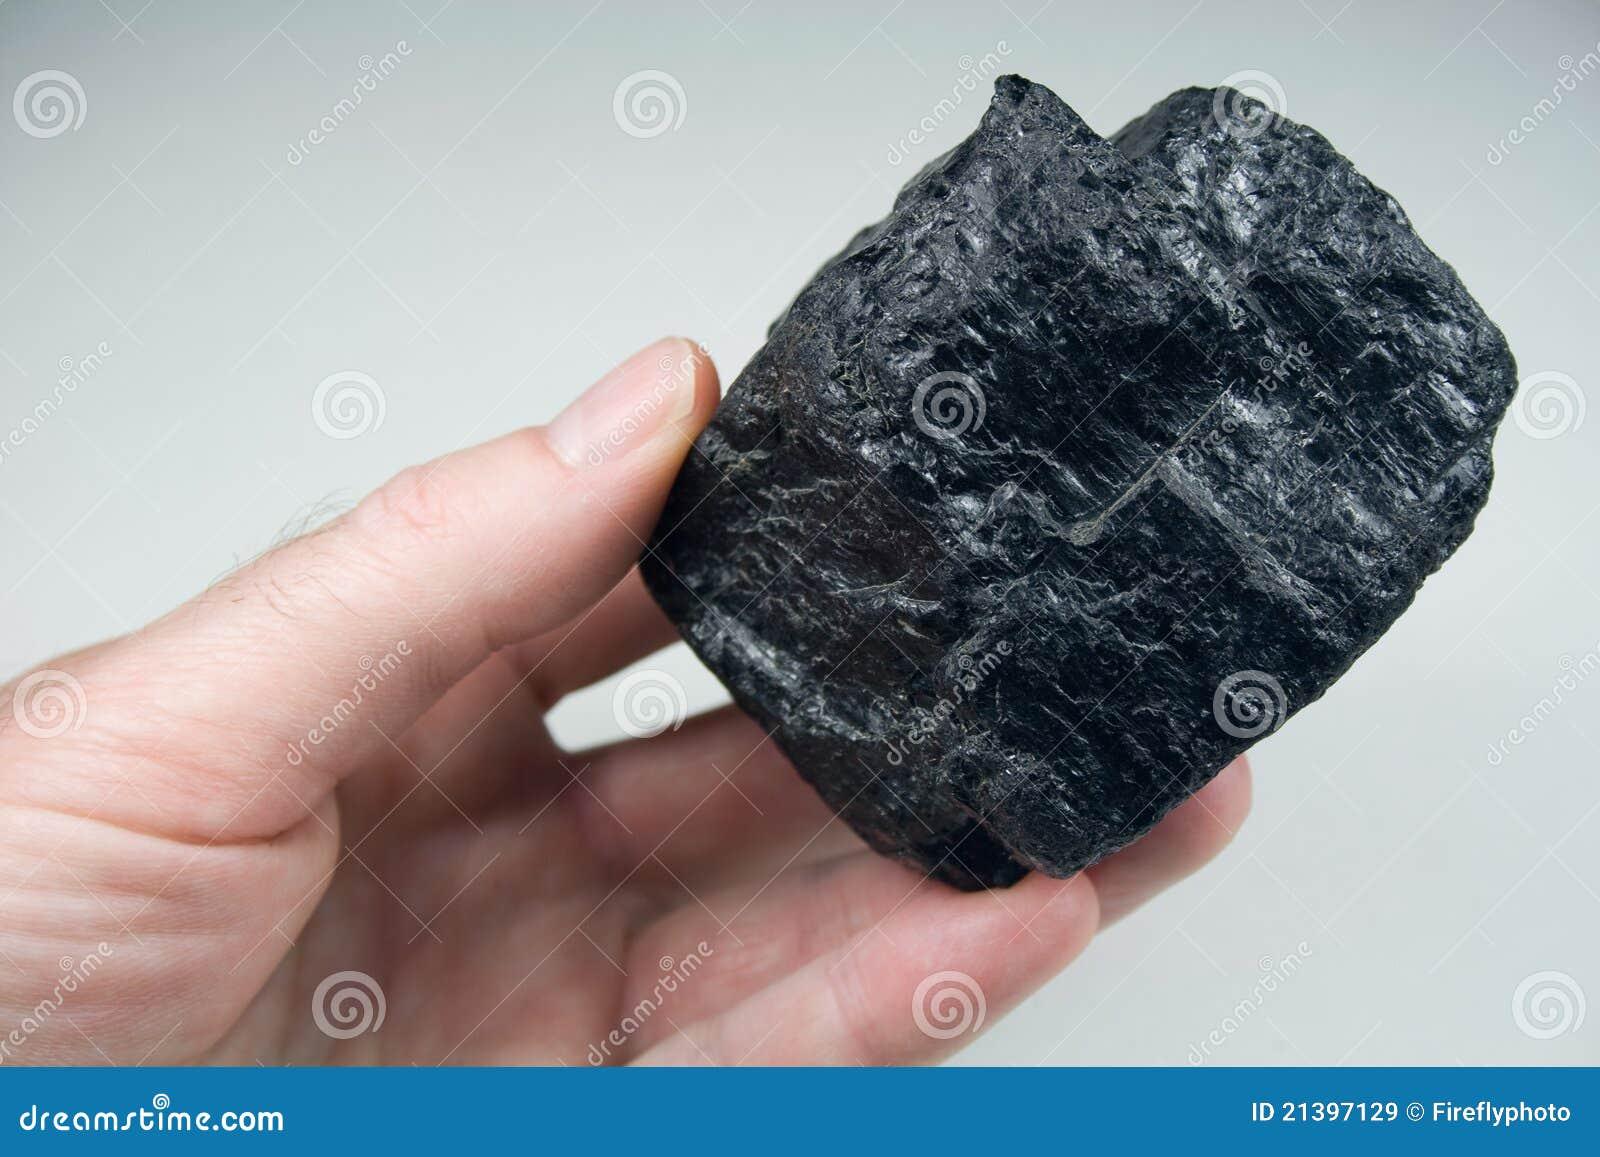 Lump of coal photo